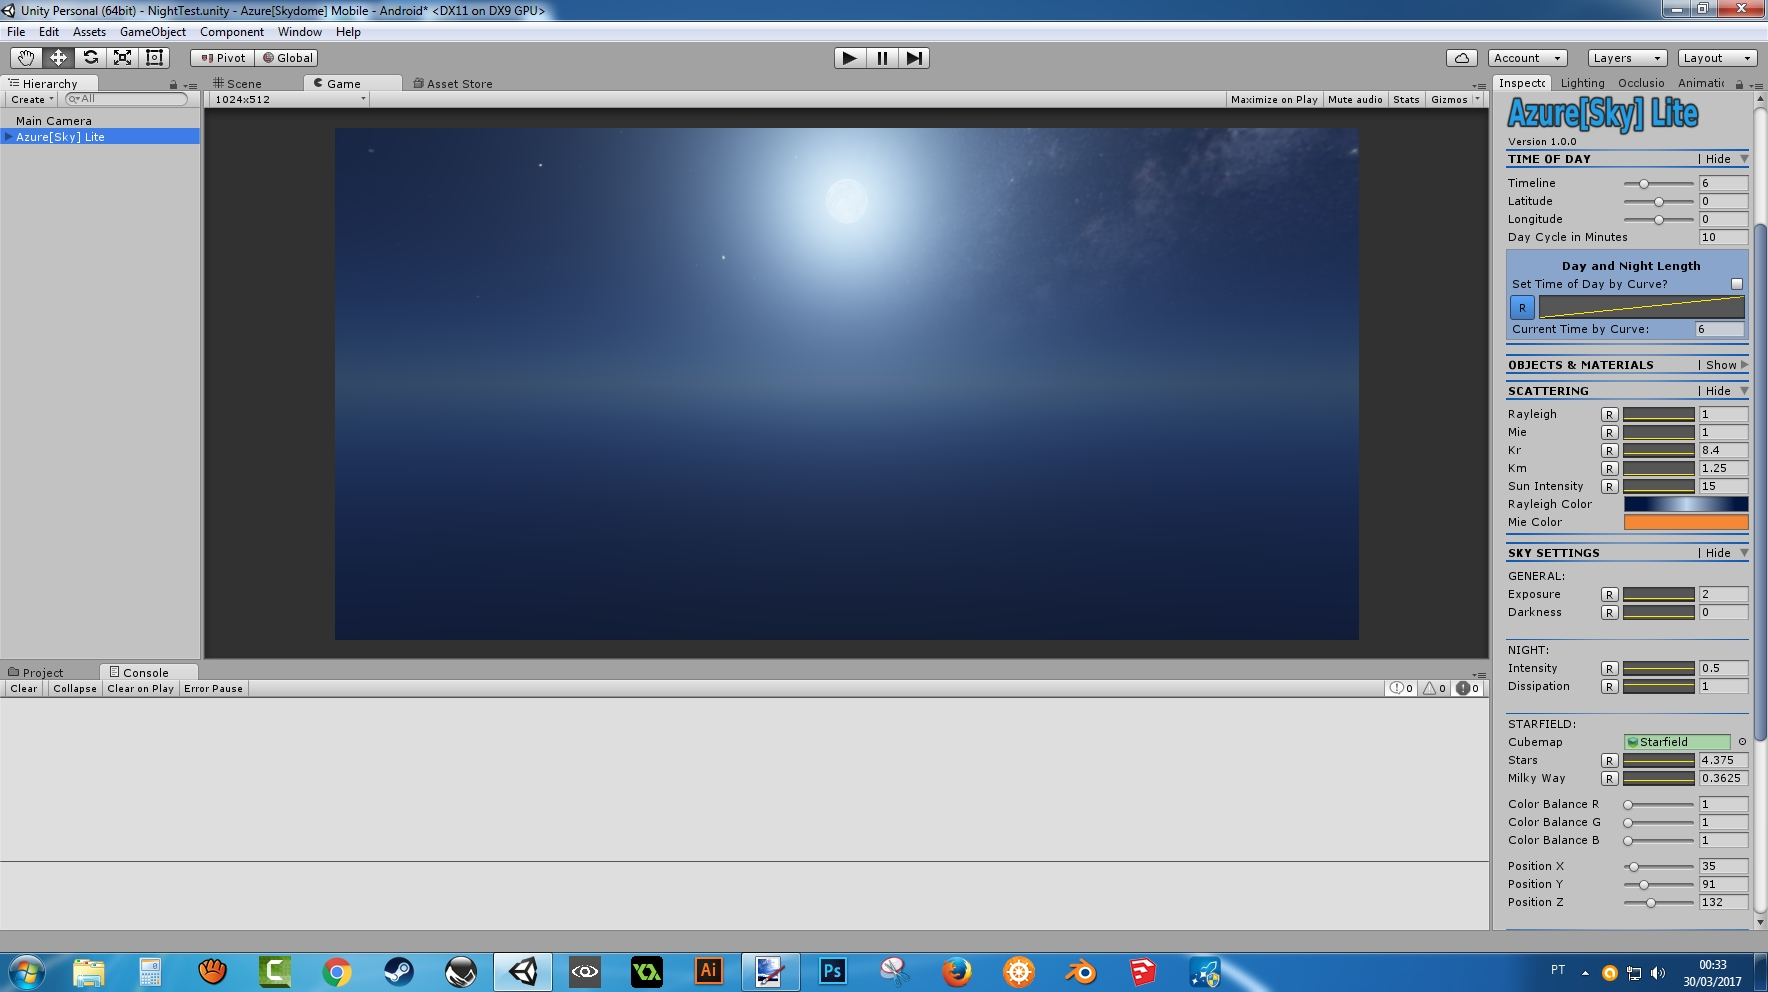 Azure[Sky] Lite.jpg